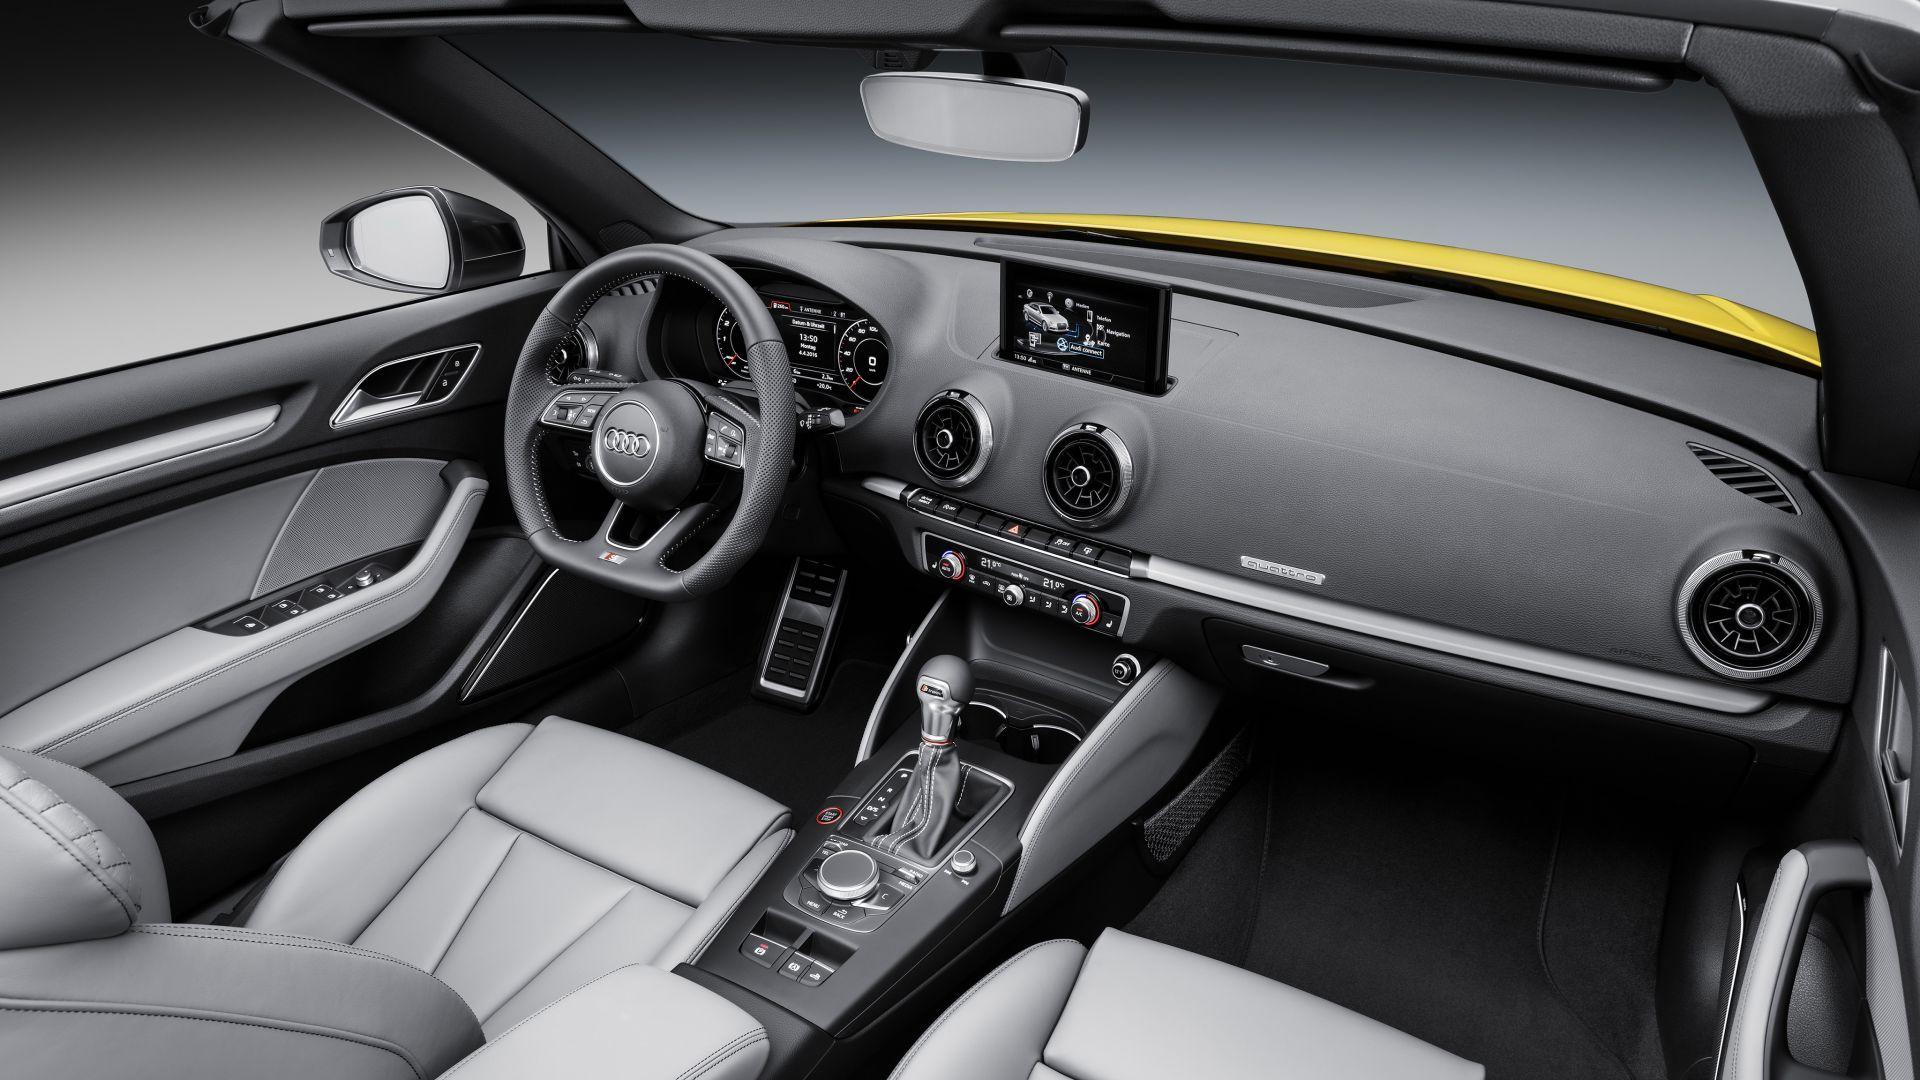 Wallpaper audi s3 cabriolet interior cars bikes 10264 for Audi s3 interior